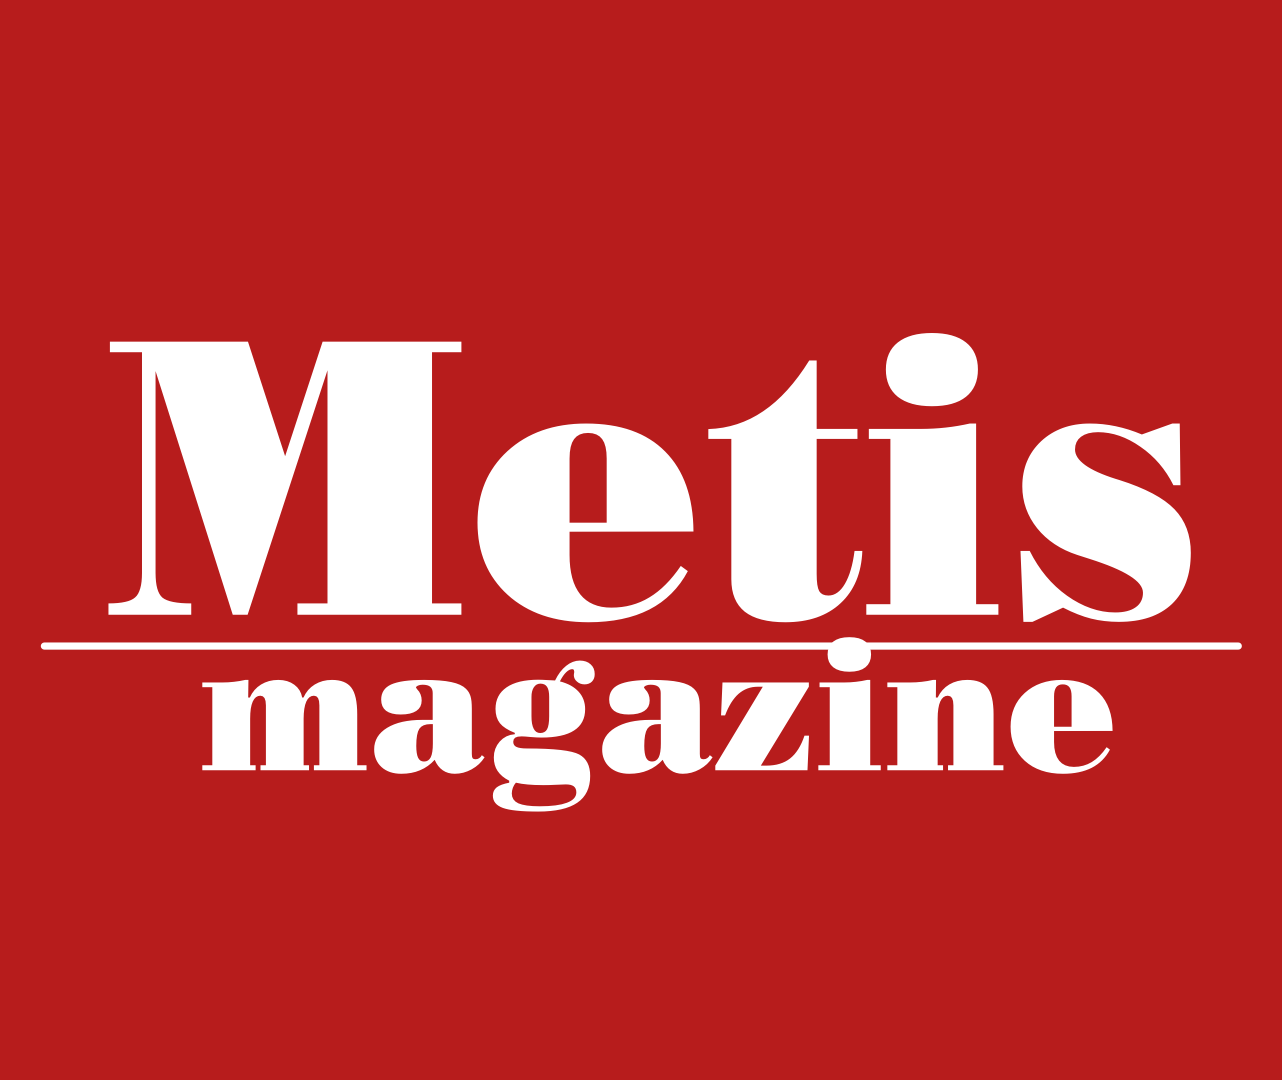 Metis Magazine